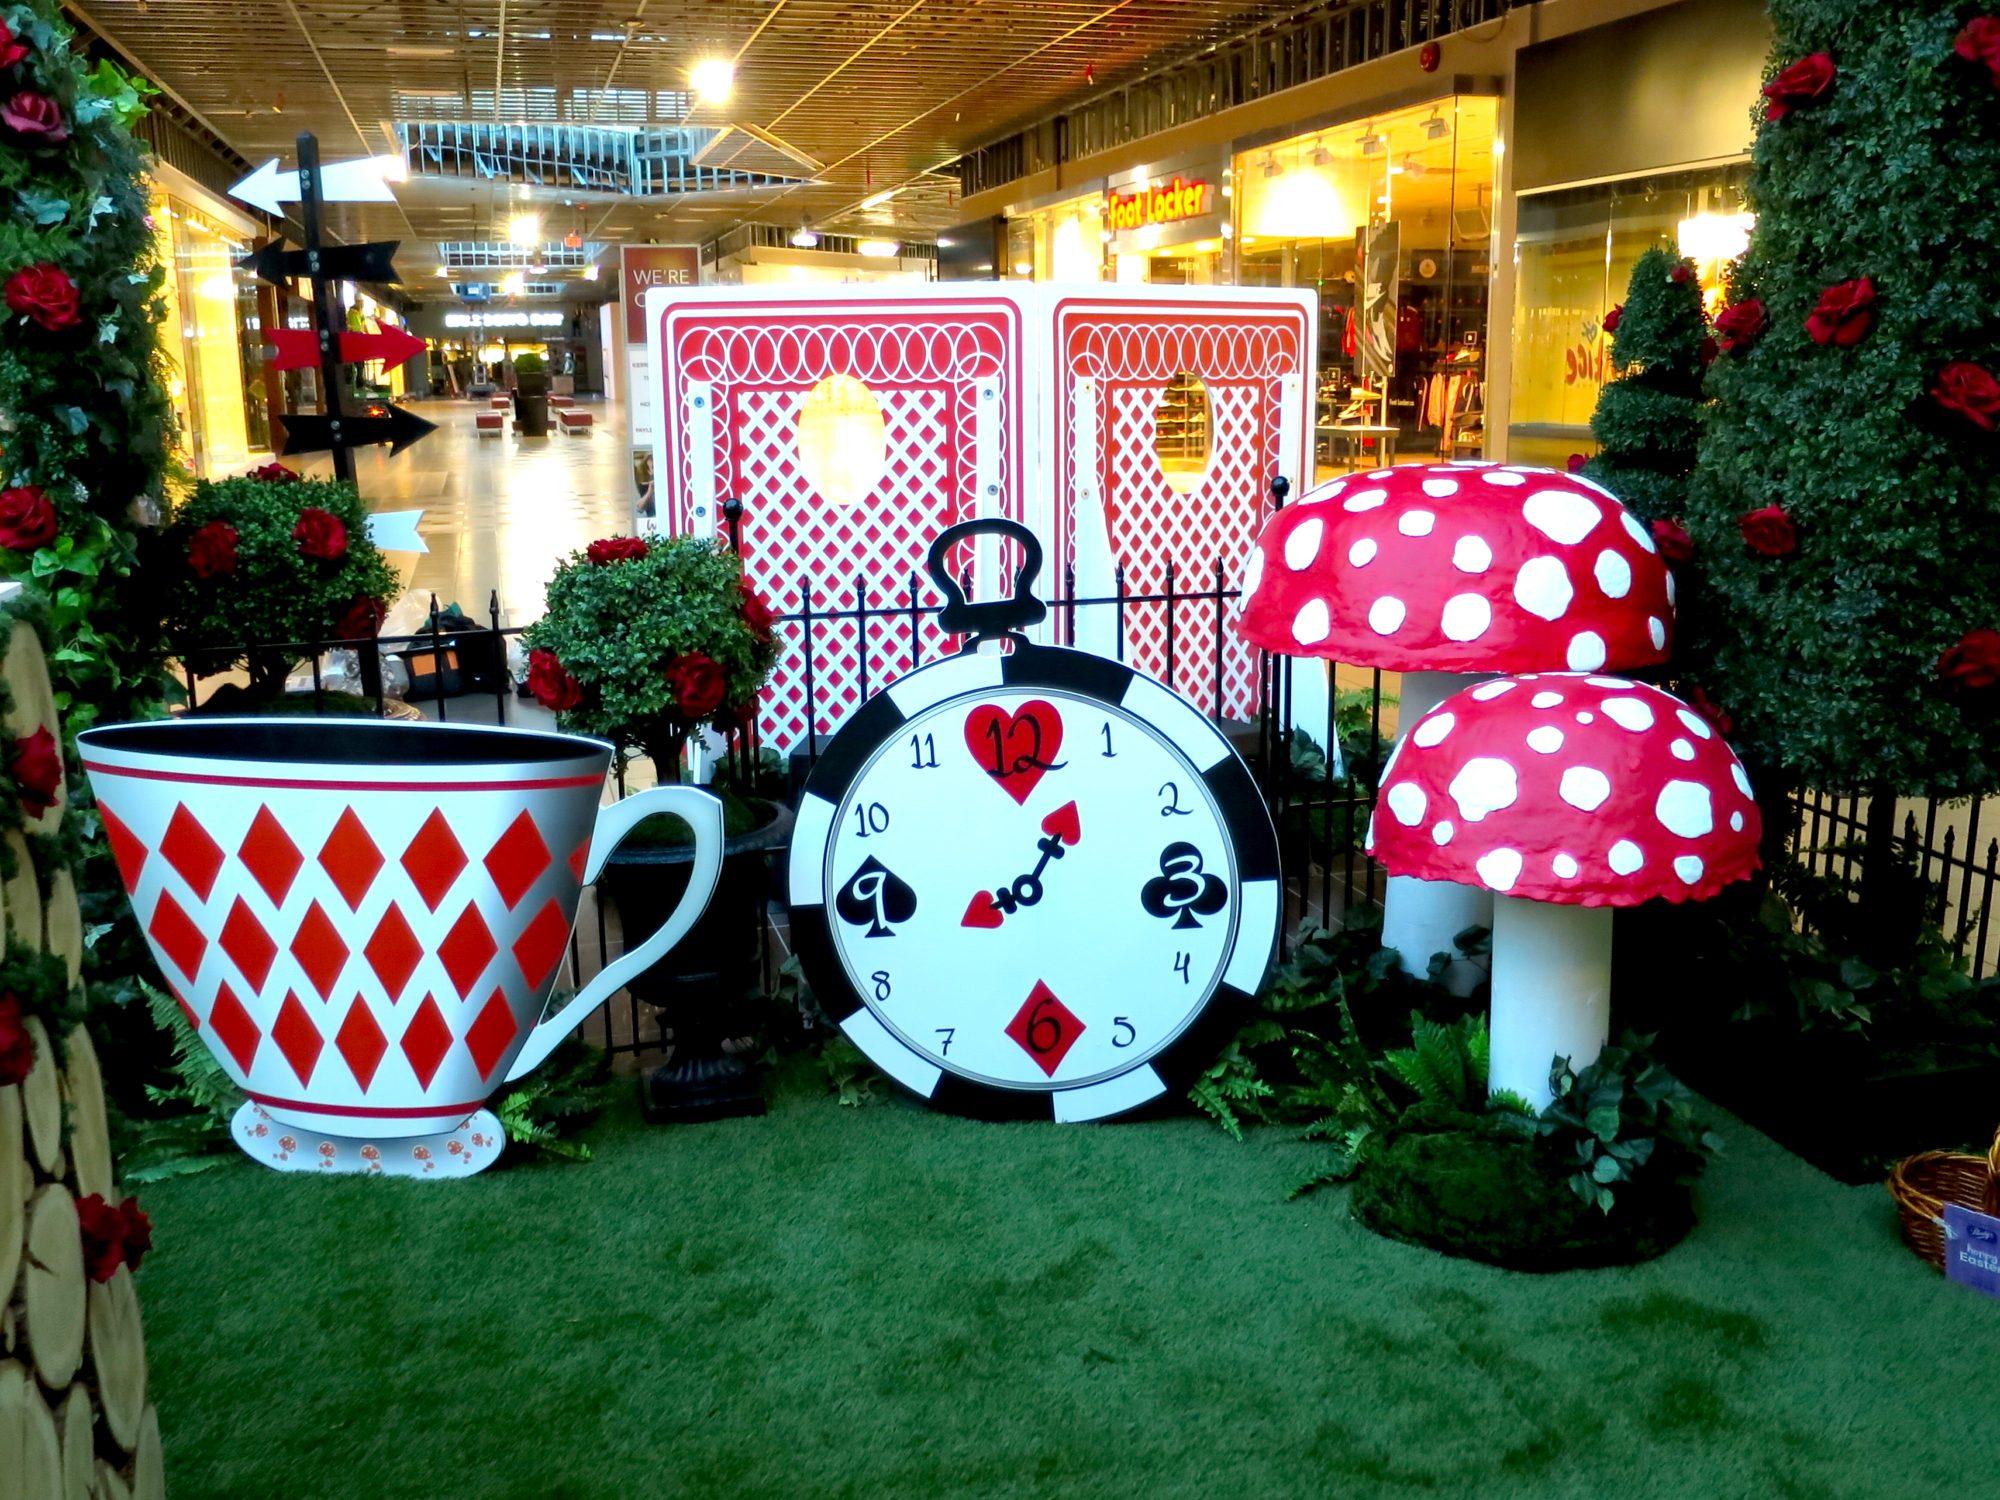 Alice In Wonderland Easter Set Design Shopping Centre